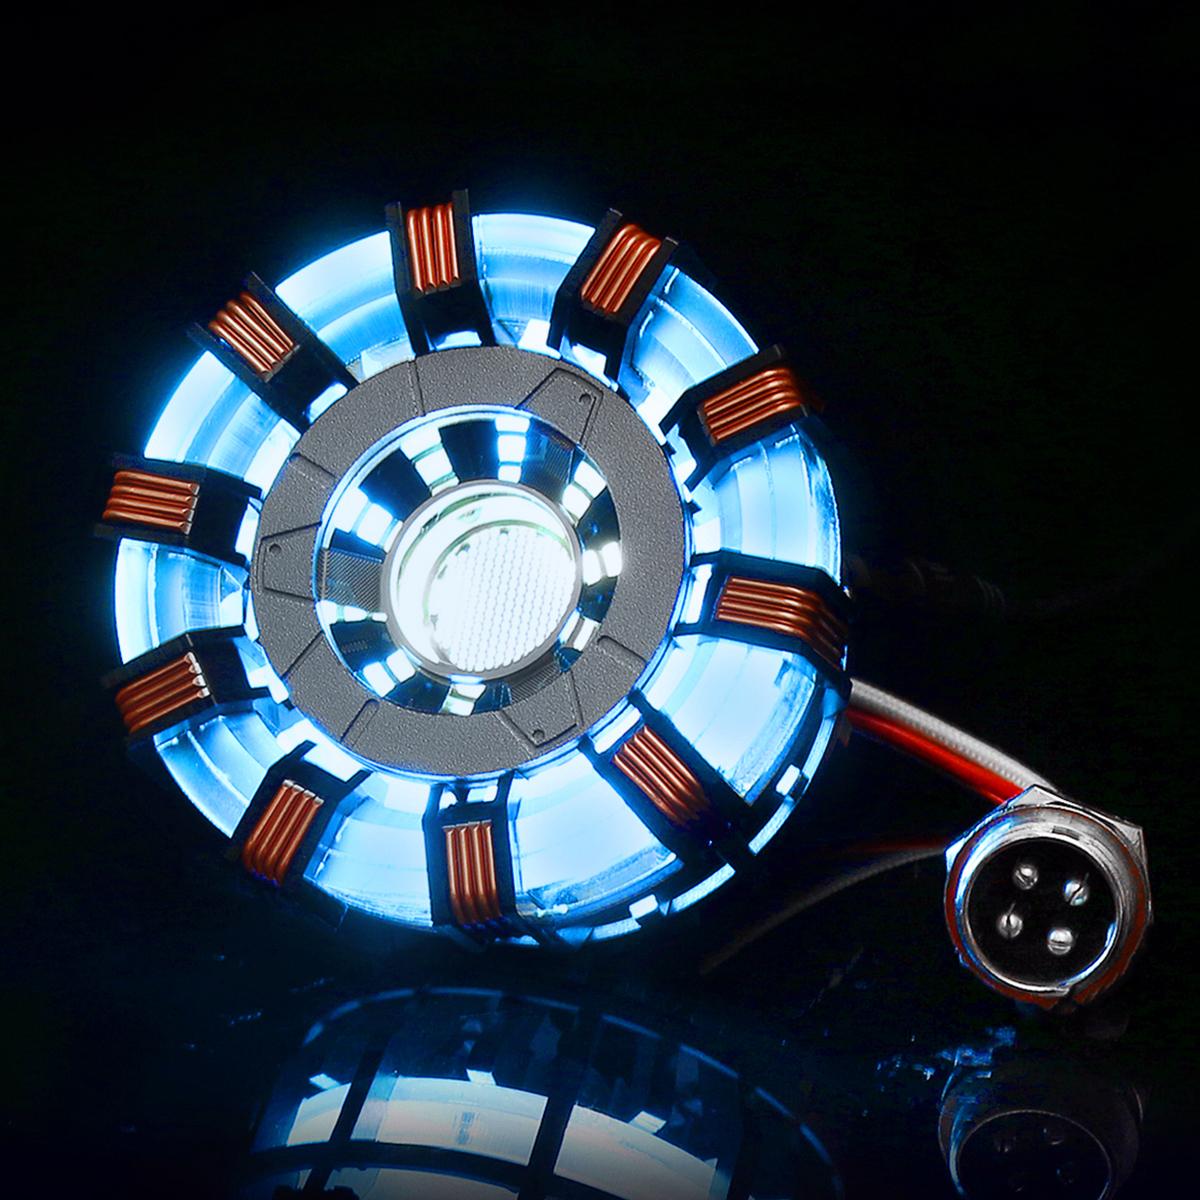 MK2 Tony DIY Arc Reactor Lamp Stainless Steel Kit Illuminant LED Flash Light Set